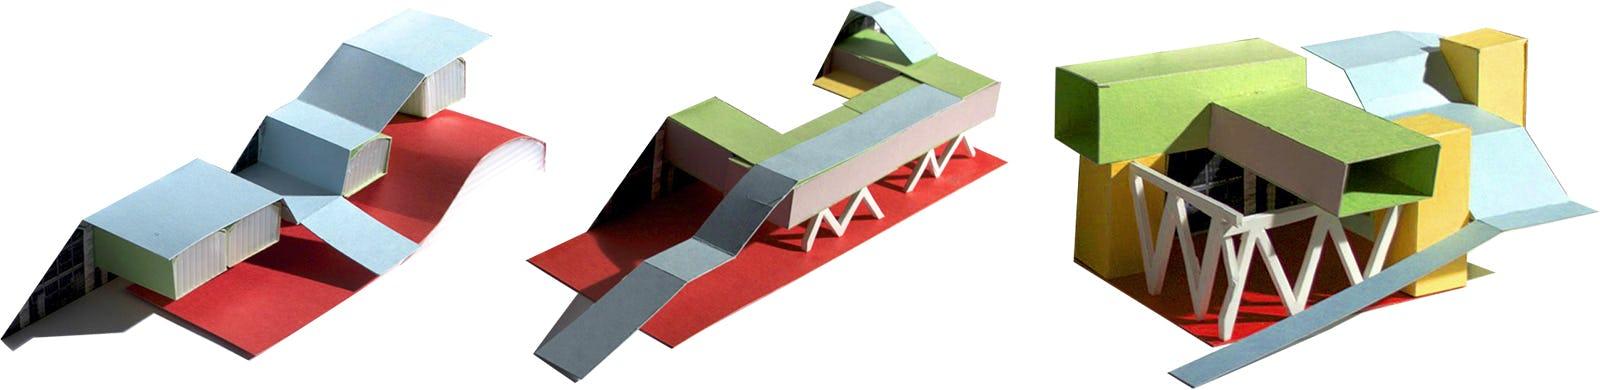 9df35a2e bfb8 4d84 b28c ccb5a2f65793%2fbryanmaddock dmachine study models